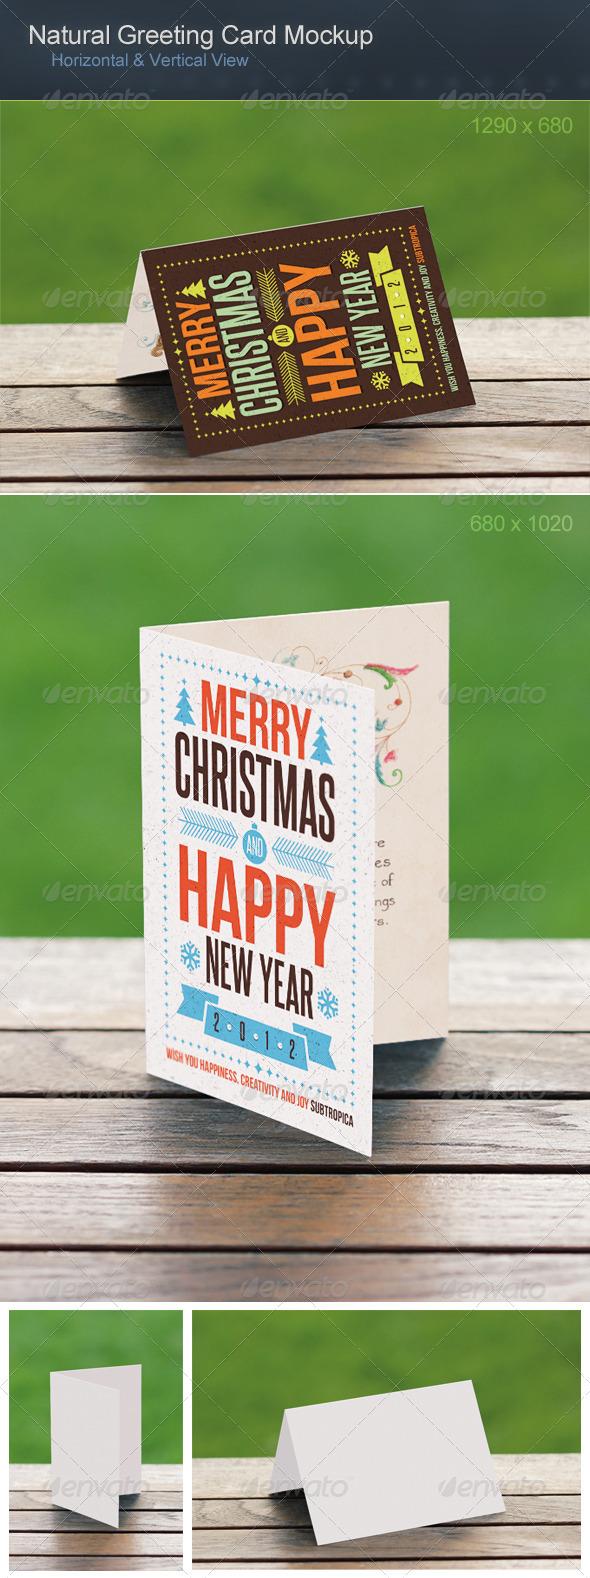 GraphicRiver Natural Greeting Card Mockup 2769358